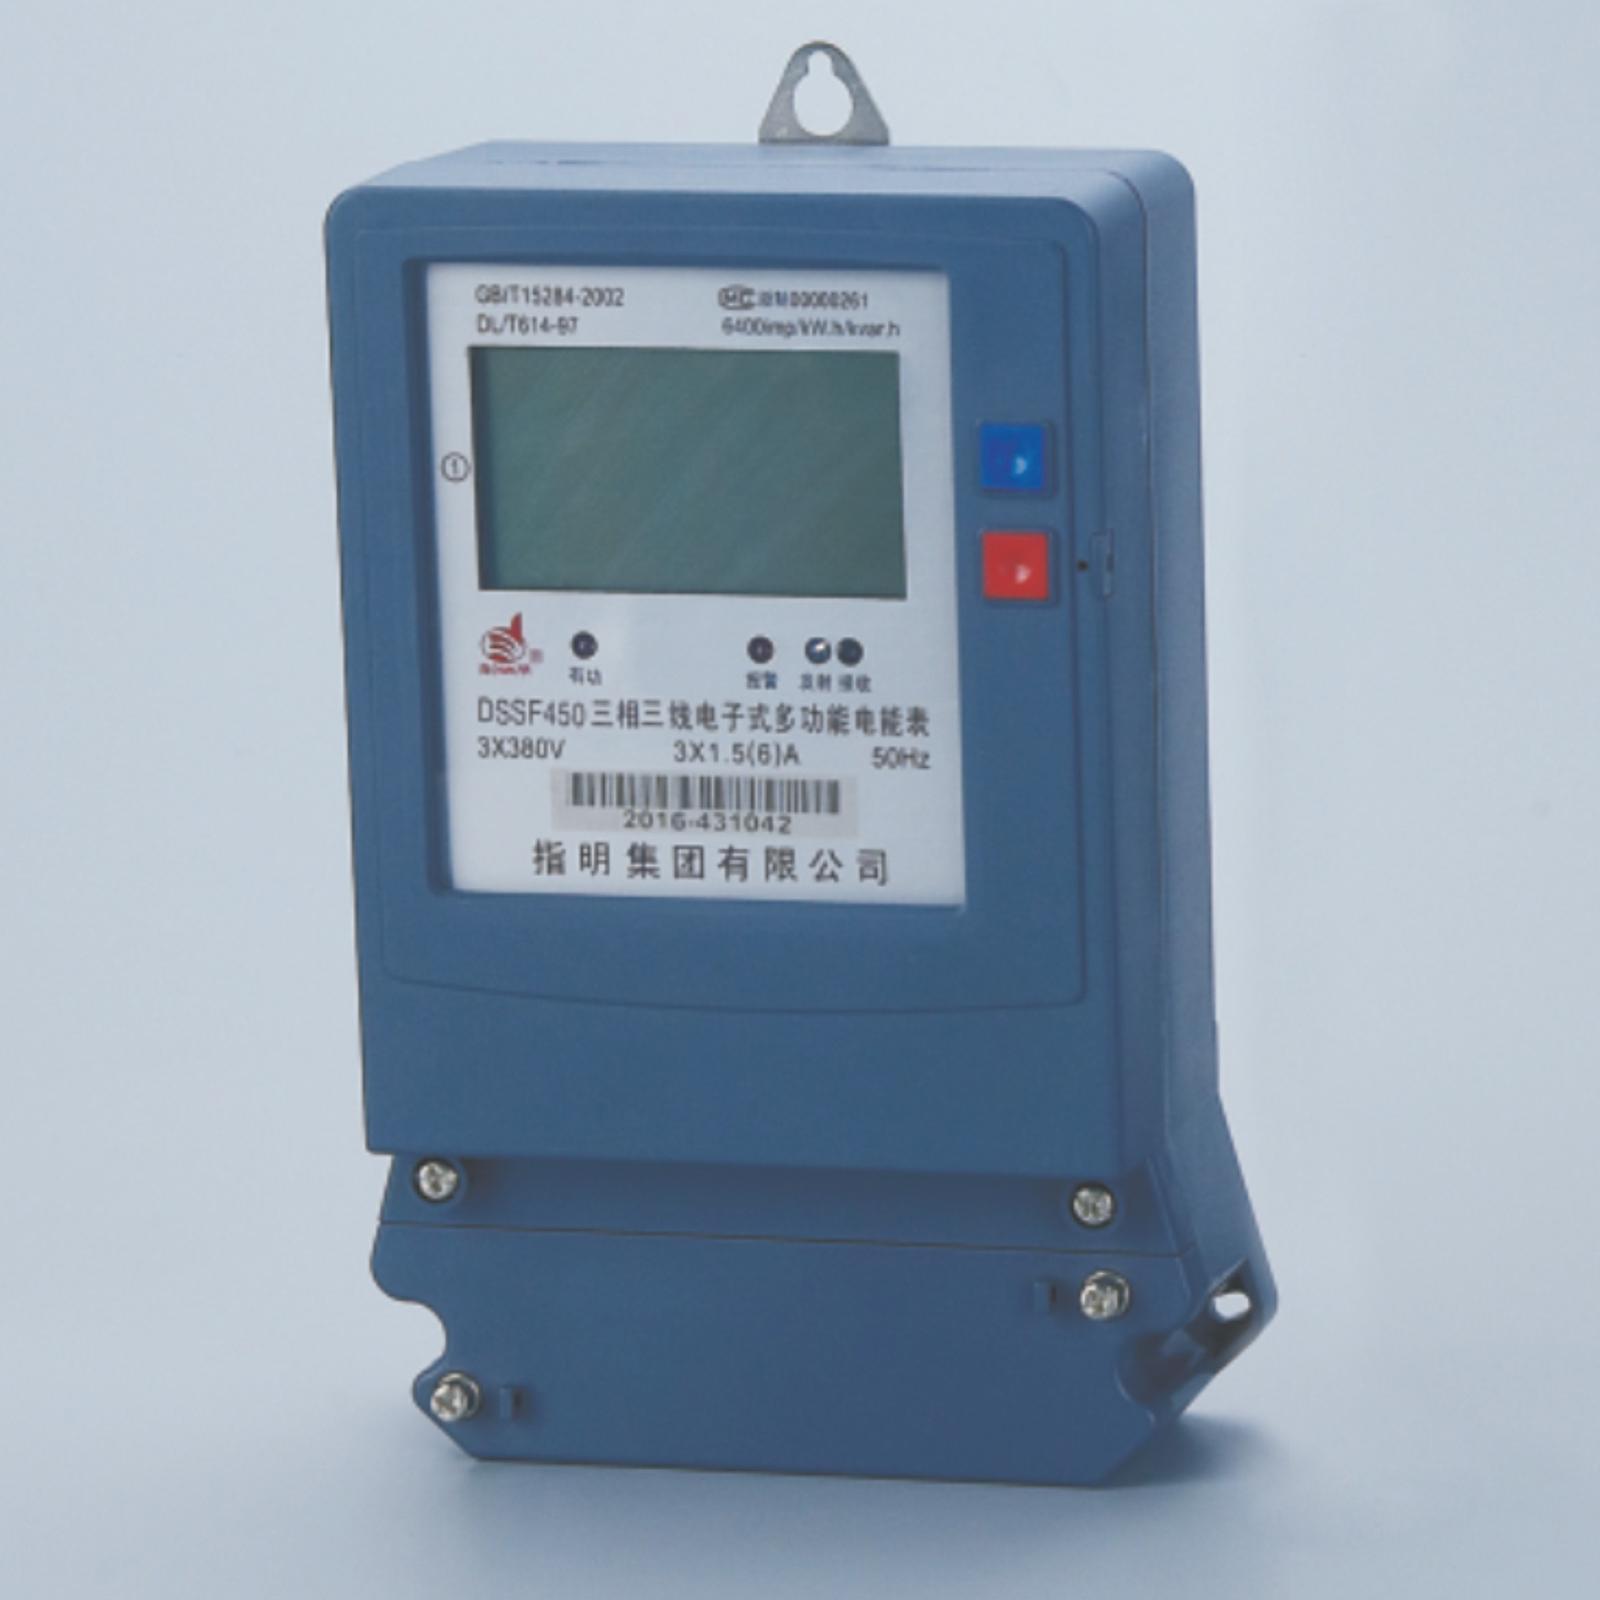 DTSF450, DSSF450 Three-phase electronic multi-tariff watt